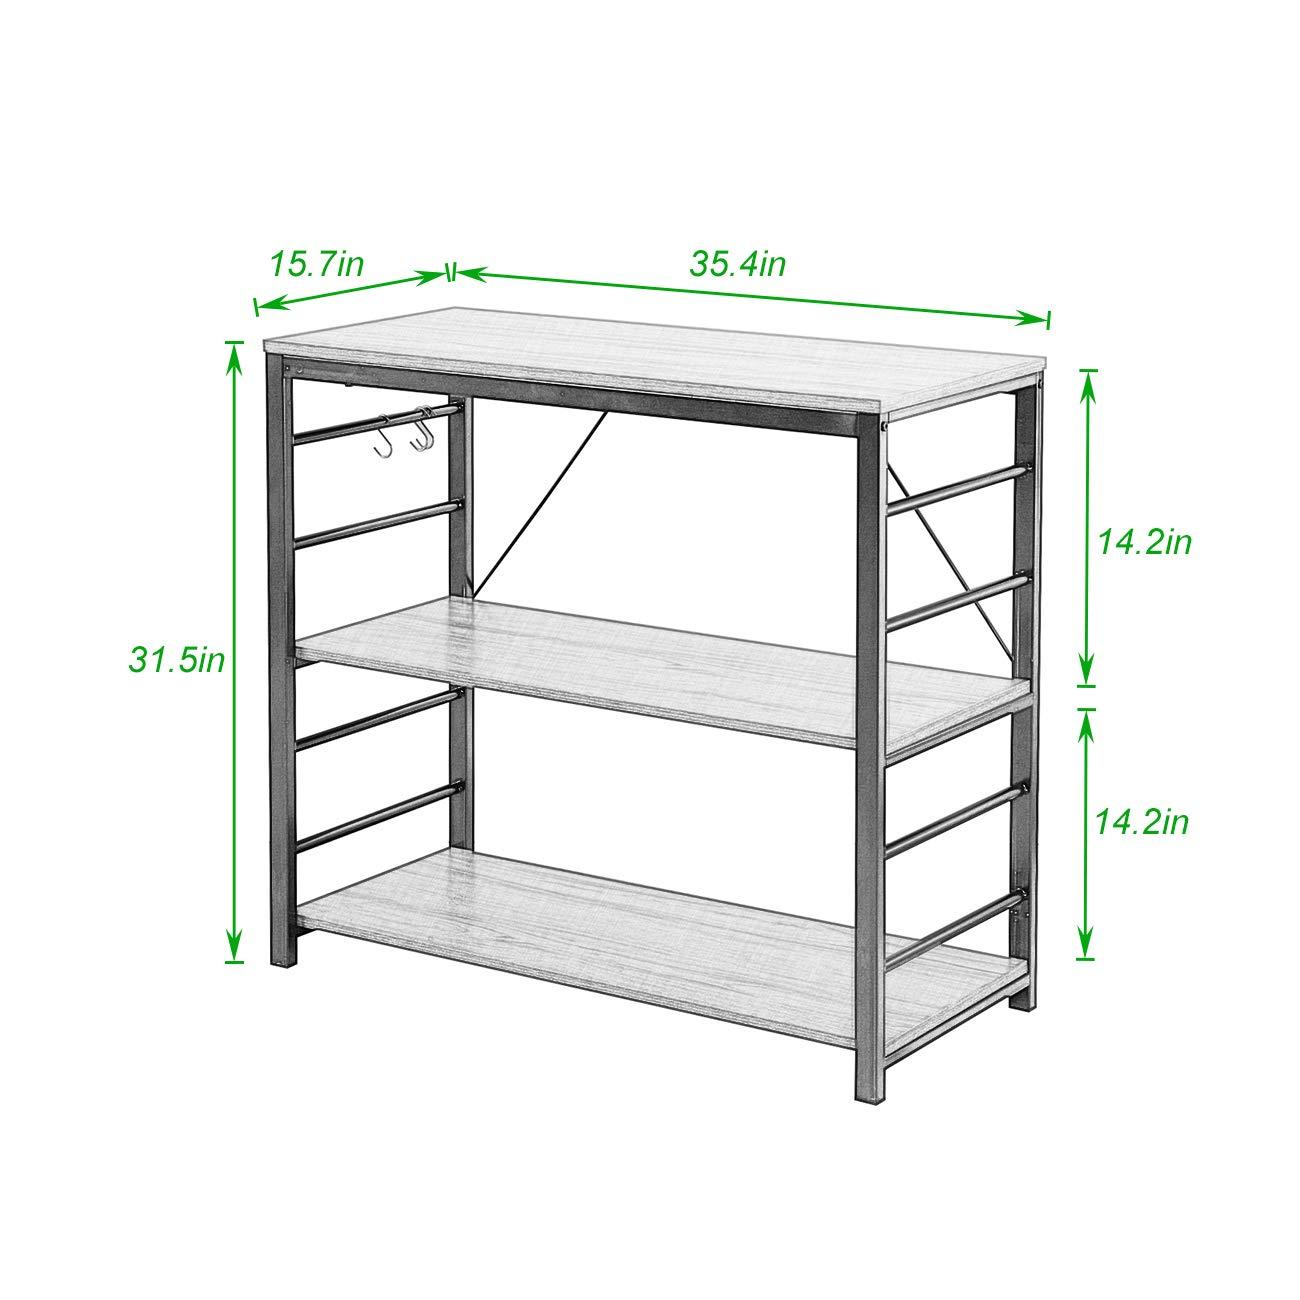 Kitchen Bakers Rack Utility Storage Shelf Microwave Stand for Spice Rack Organizer Shelf DlandHome Microwave Cart Stand LD-MR01BK